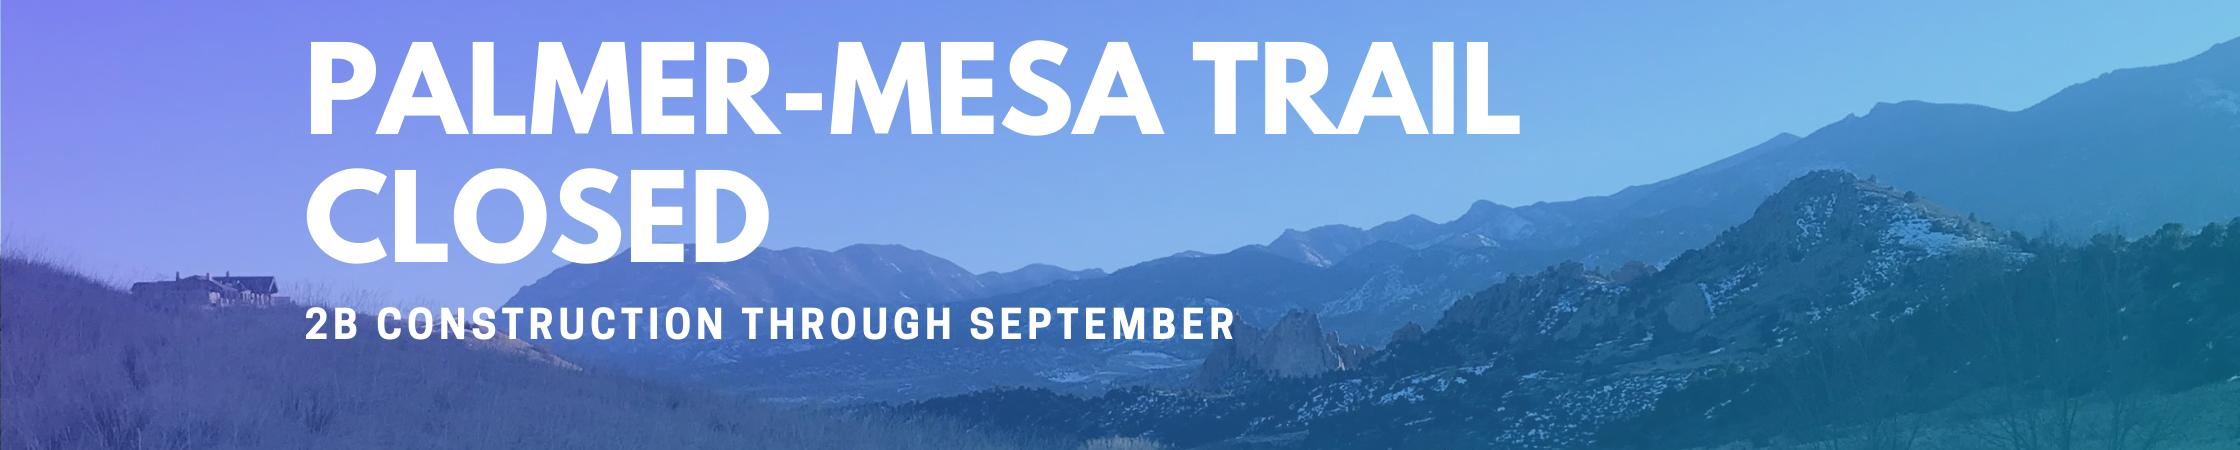 Palmer-Mesa Trail Closed For Construction Through September